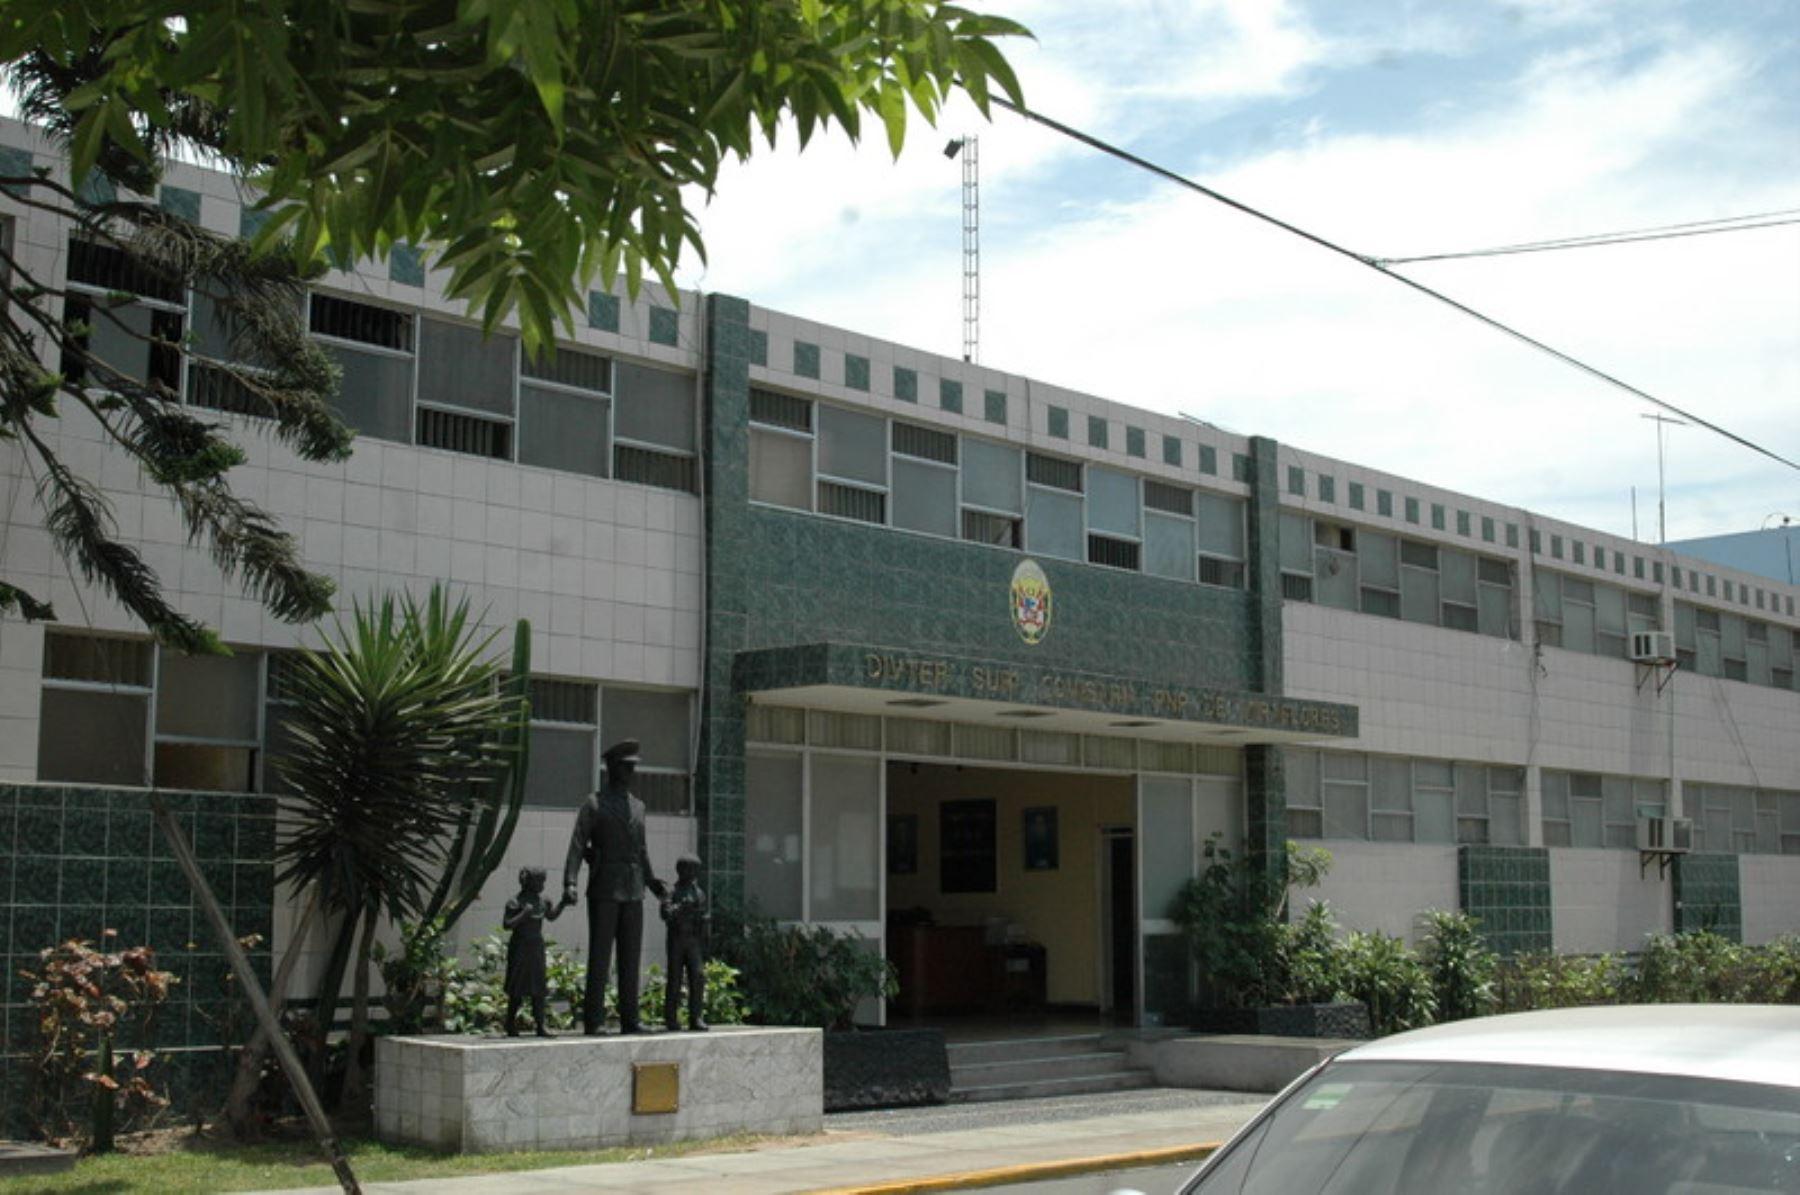 Comisaría de Miraflores. Foto: ANDINA/Difusión